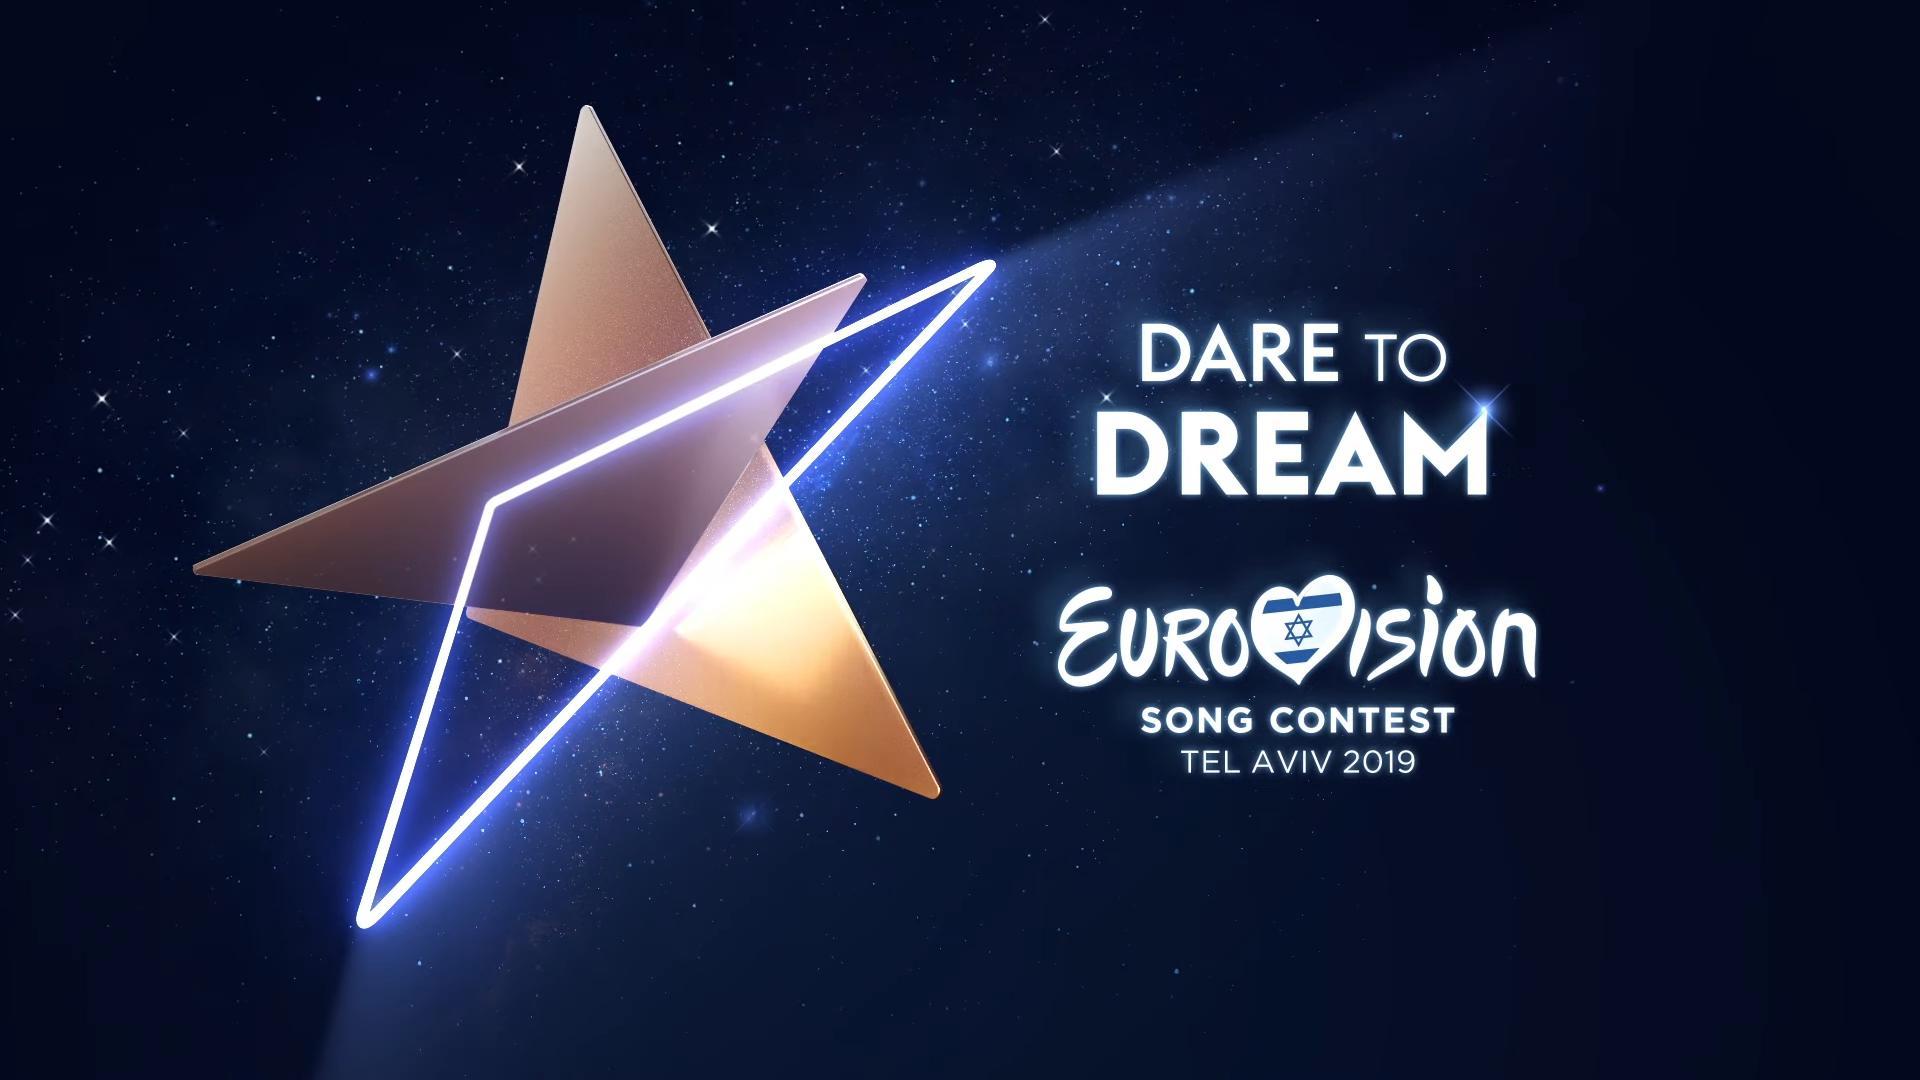 Eurovision Song Contest Tel Aviv 2019 (2019)